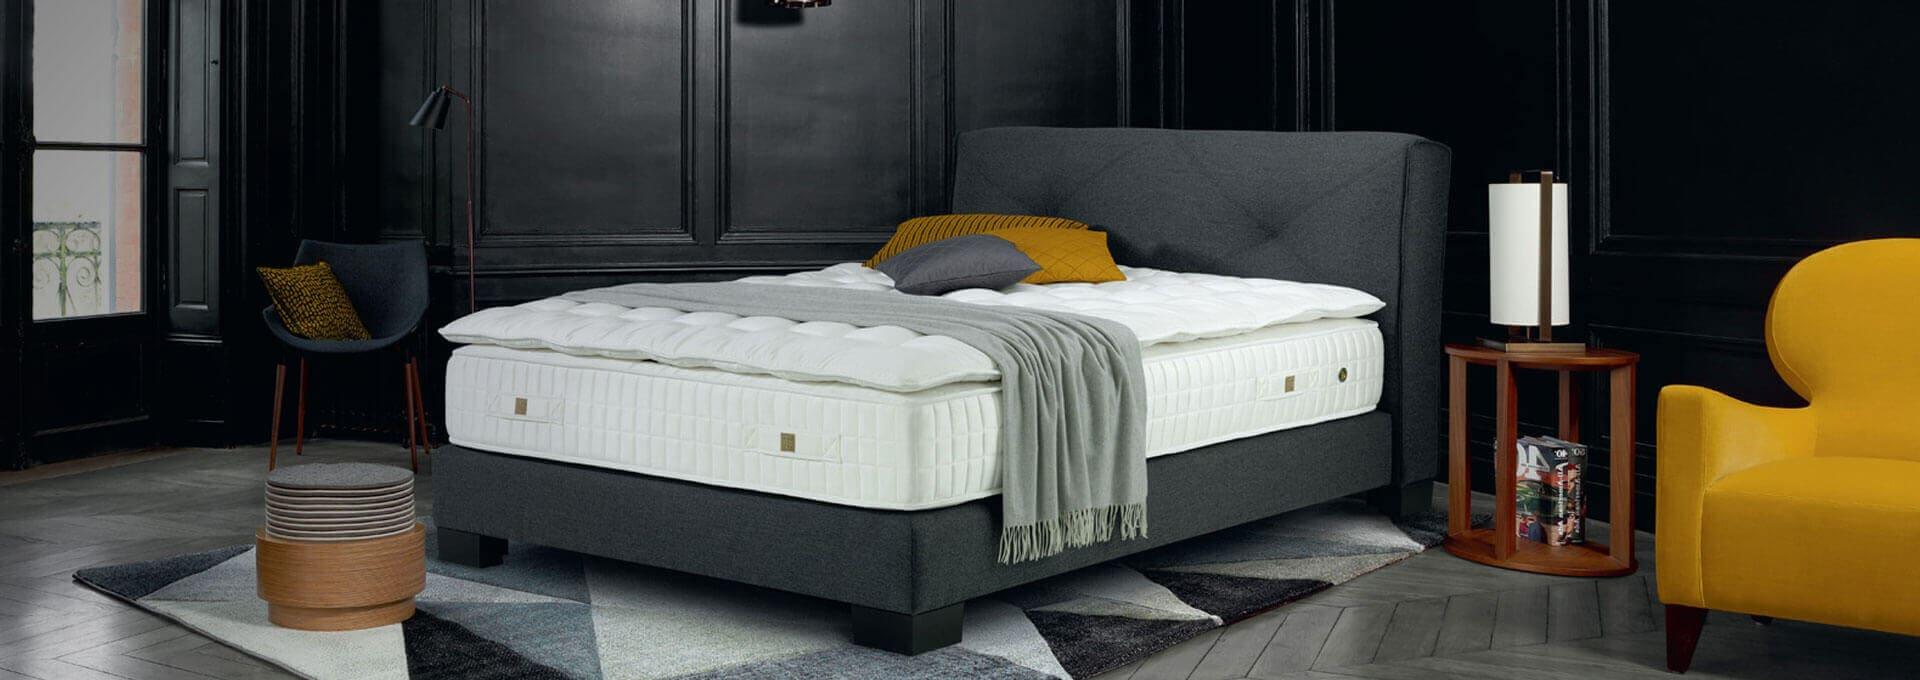 Full Size of Betten De Boxspringbetten Kln Badewanne Mit Tr Und Dusche Bett Betten.de